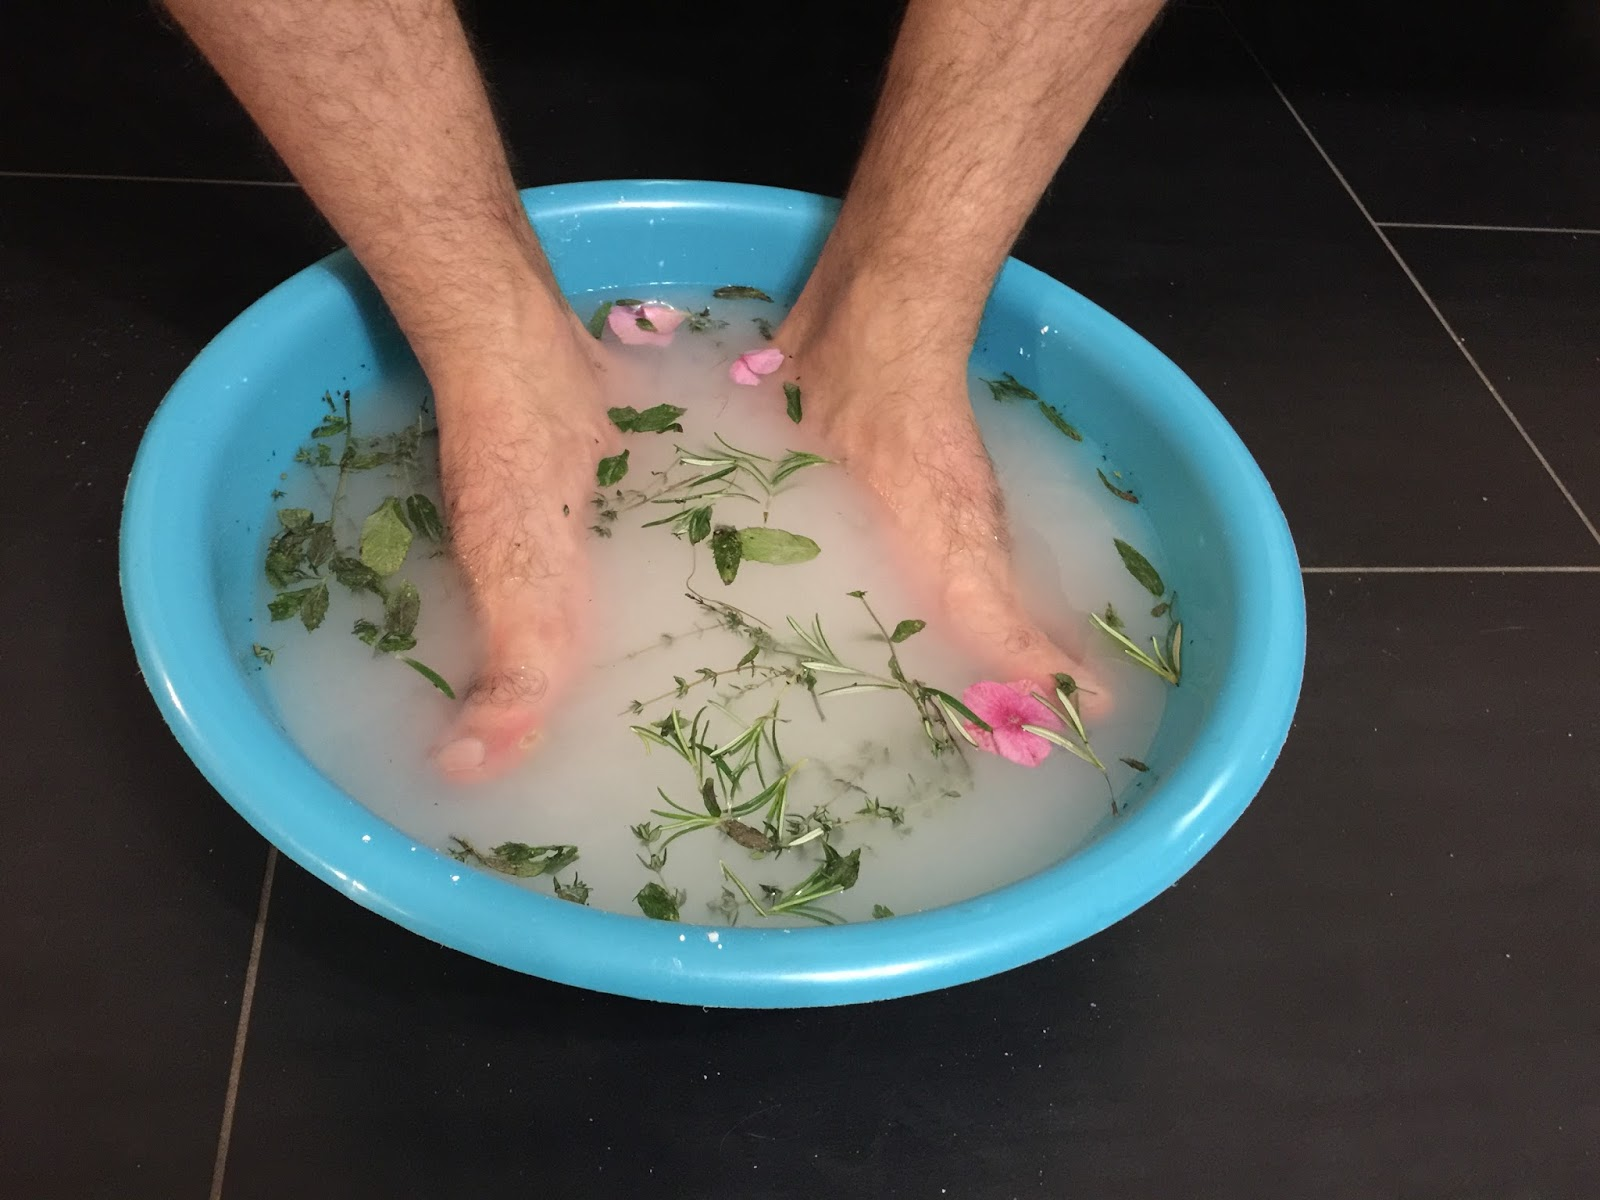 bain relaxant pied